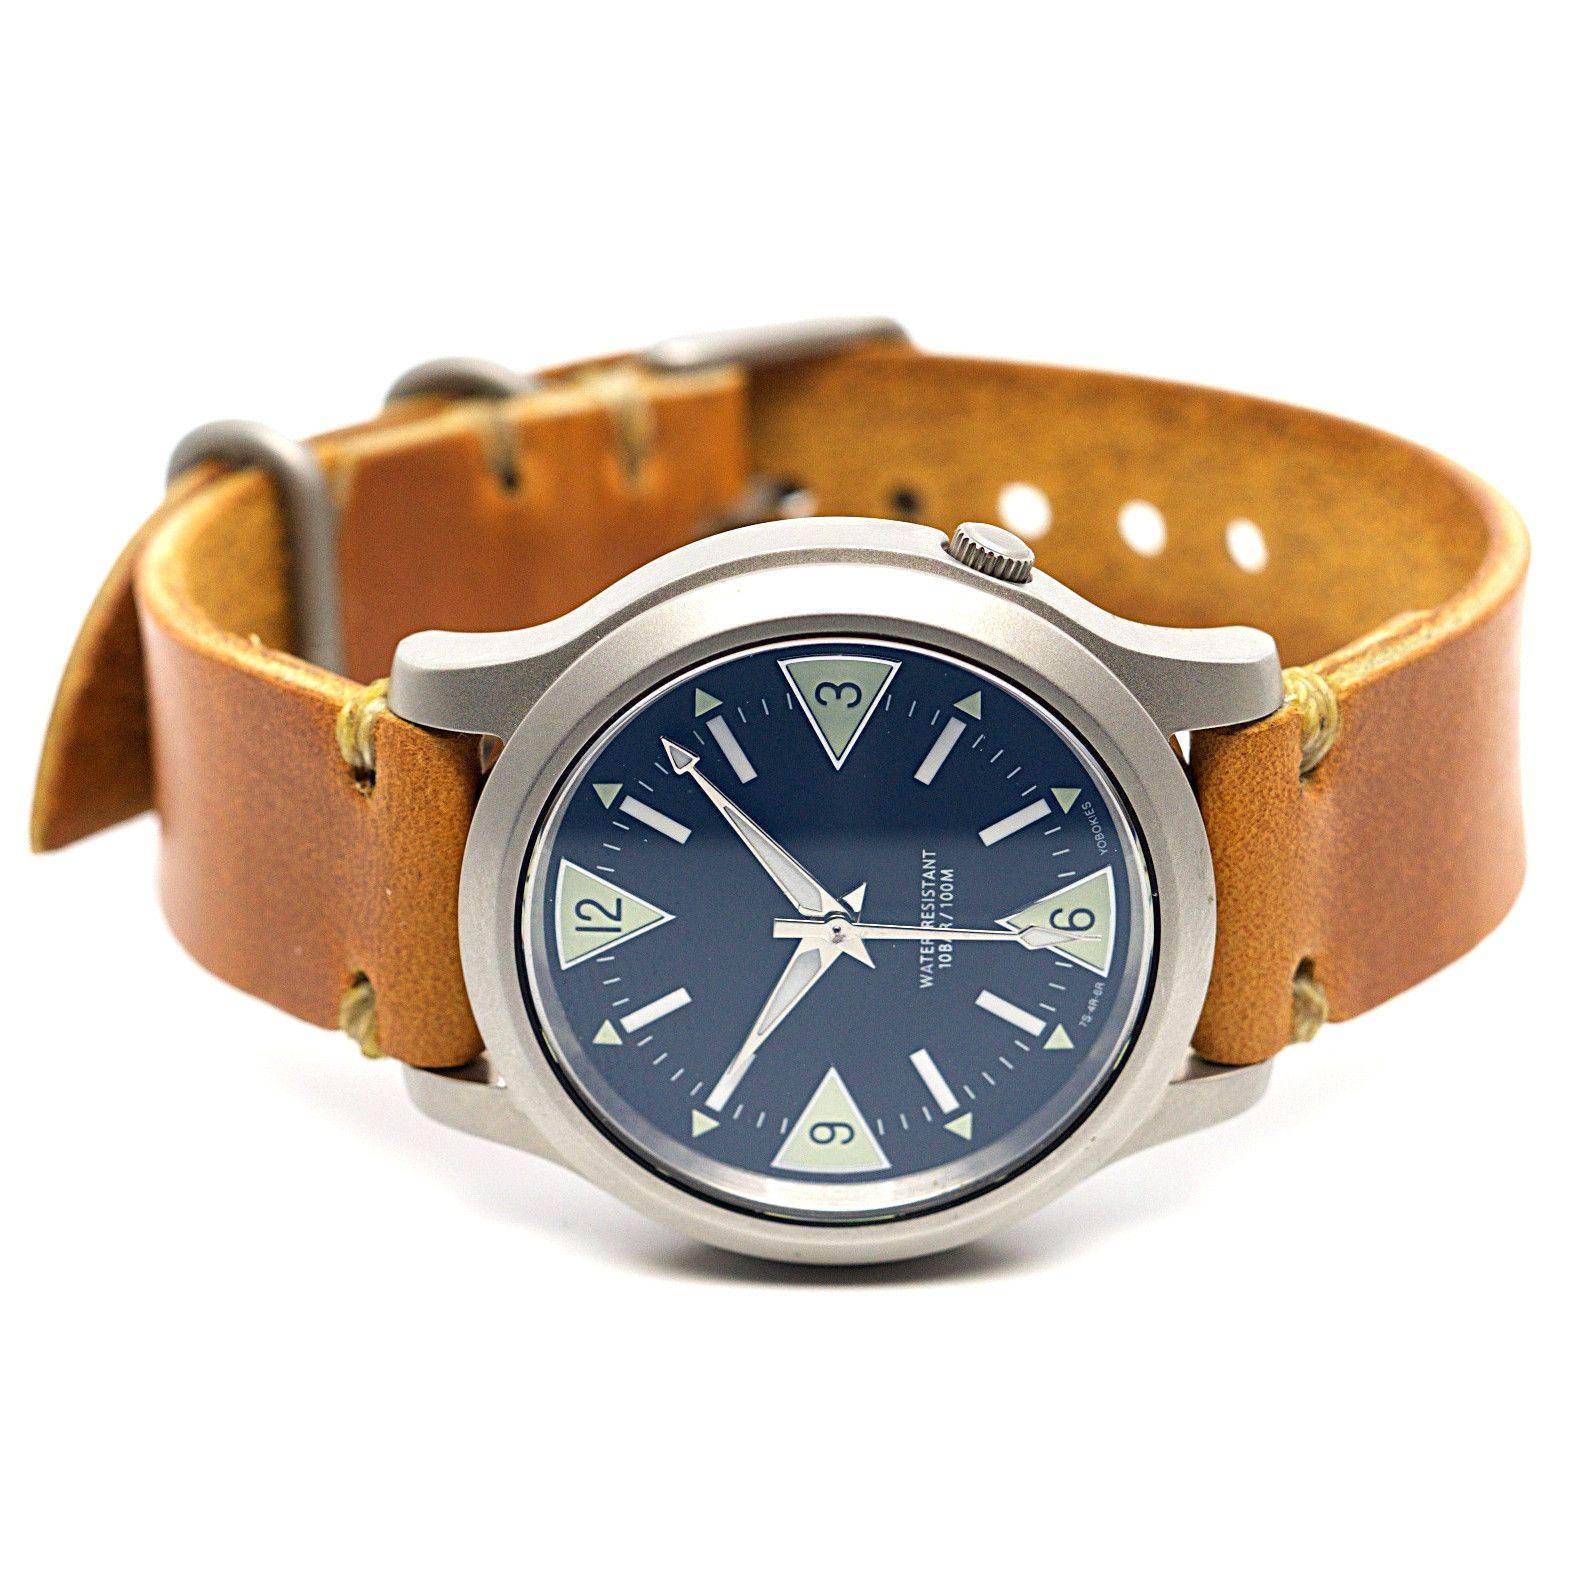 E3 seiko retro mod 38mm automatic watch vintage diver vintage automatic watch and products for Watches 38mm